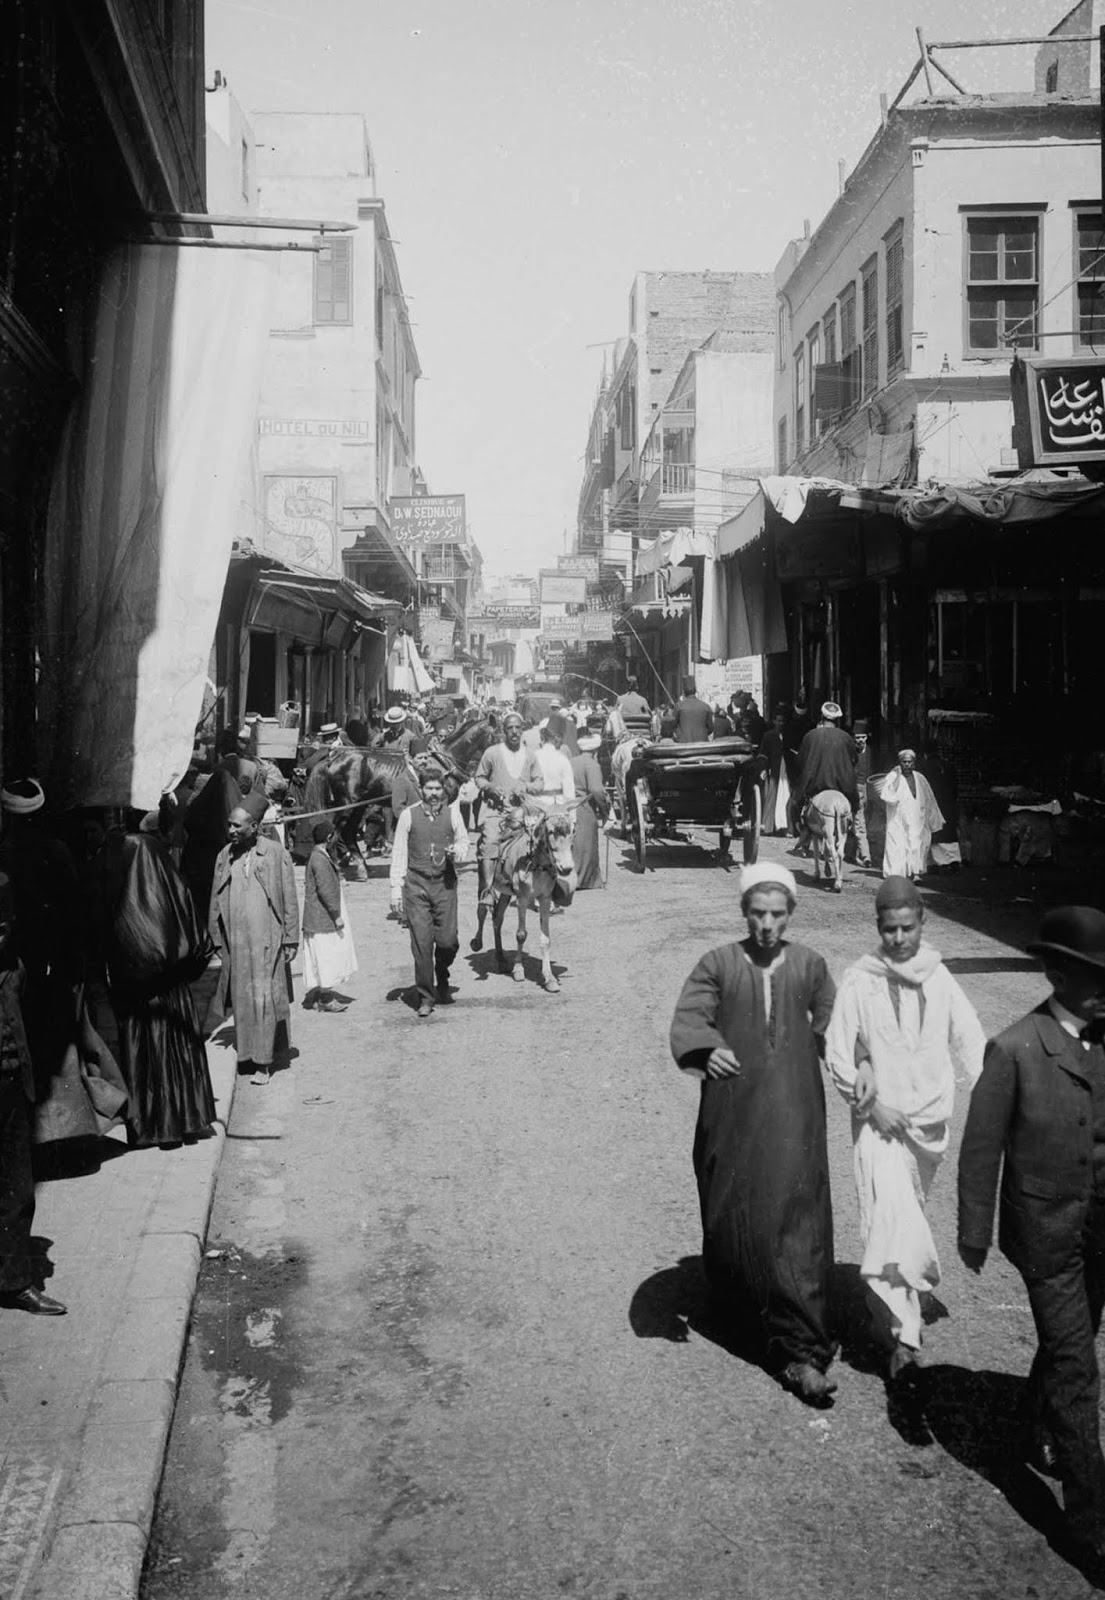 Muski Street. 1900.